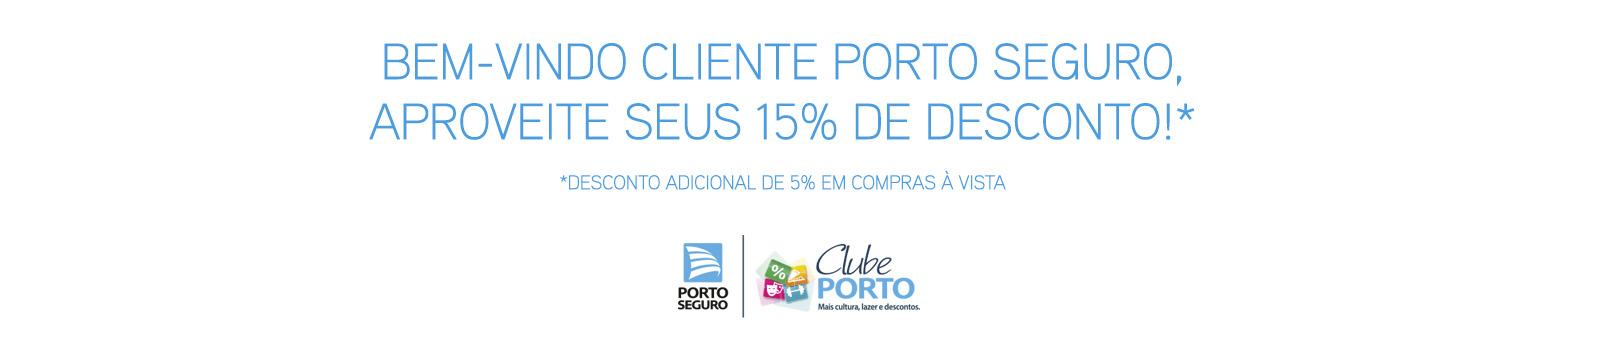 portoseguro